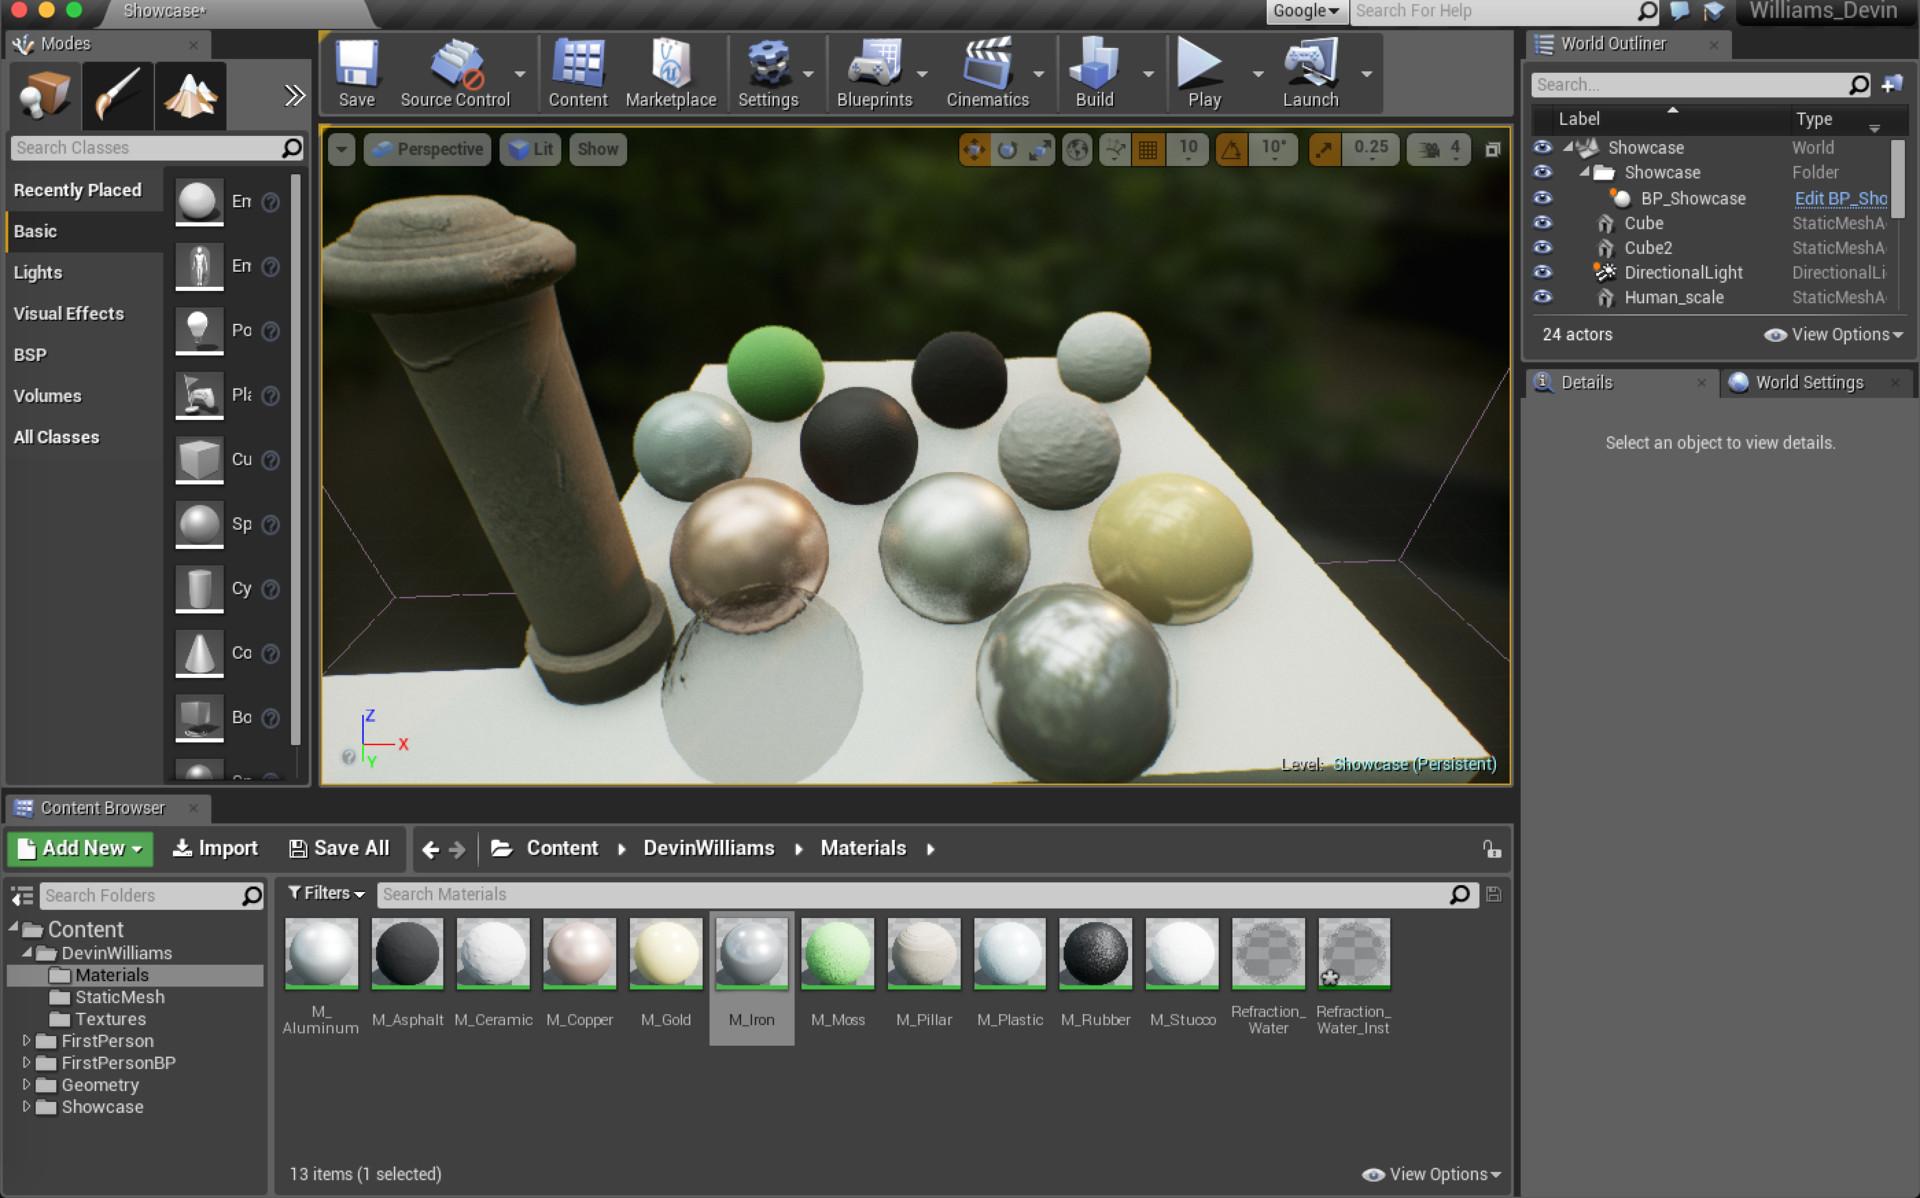 ArtStation - ACG (Art Creation for Games) Daily Assignment 2 Pillar